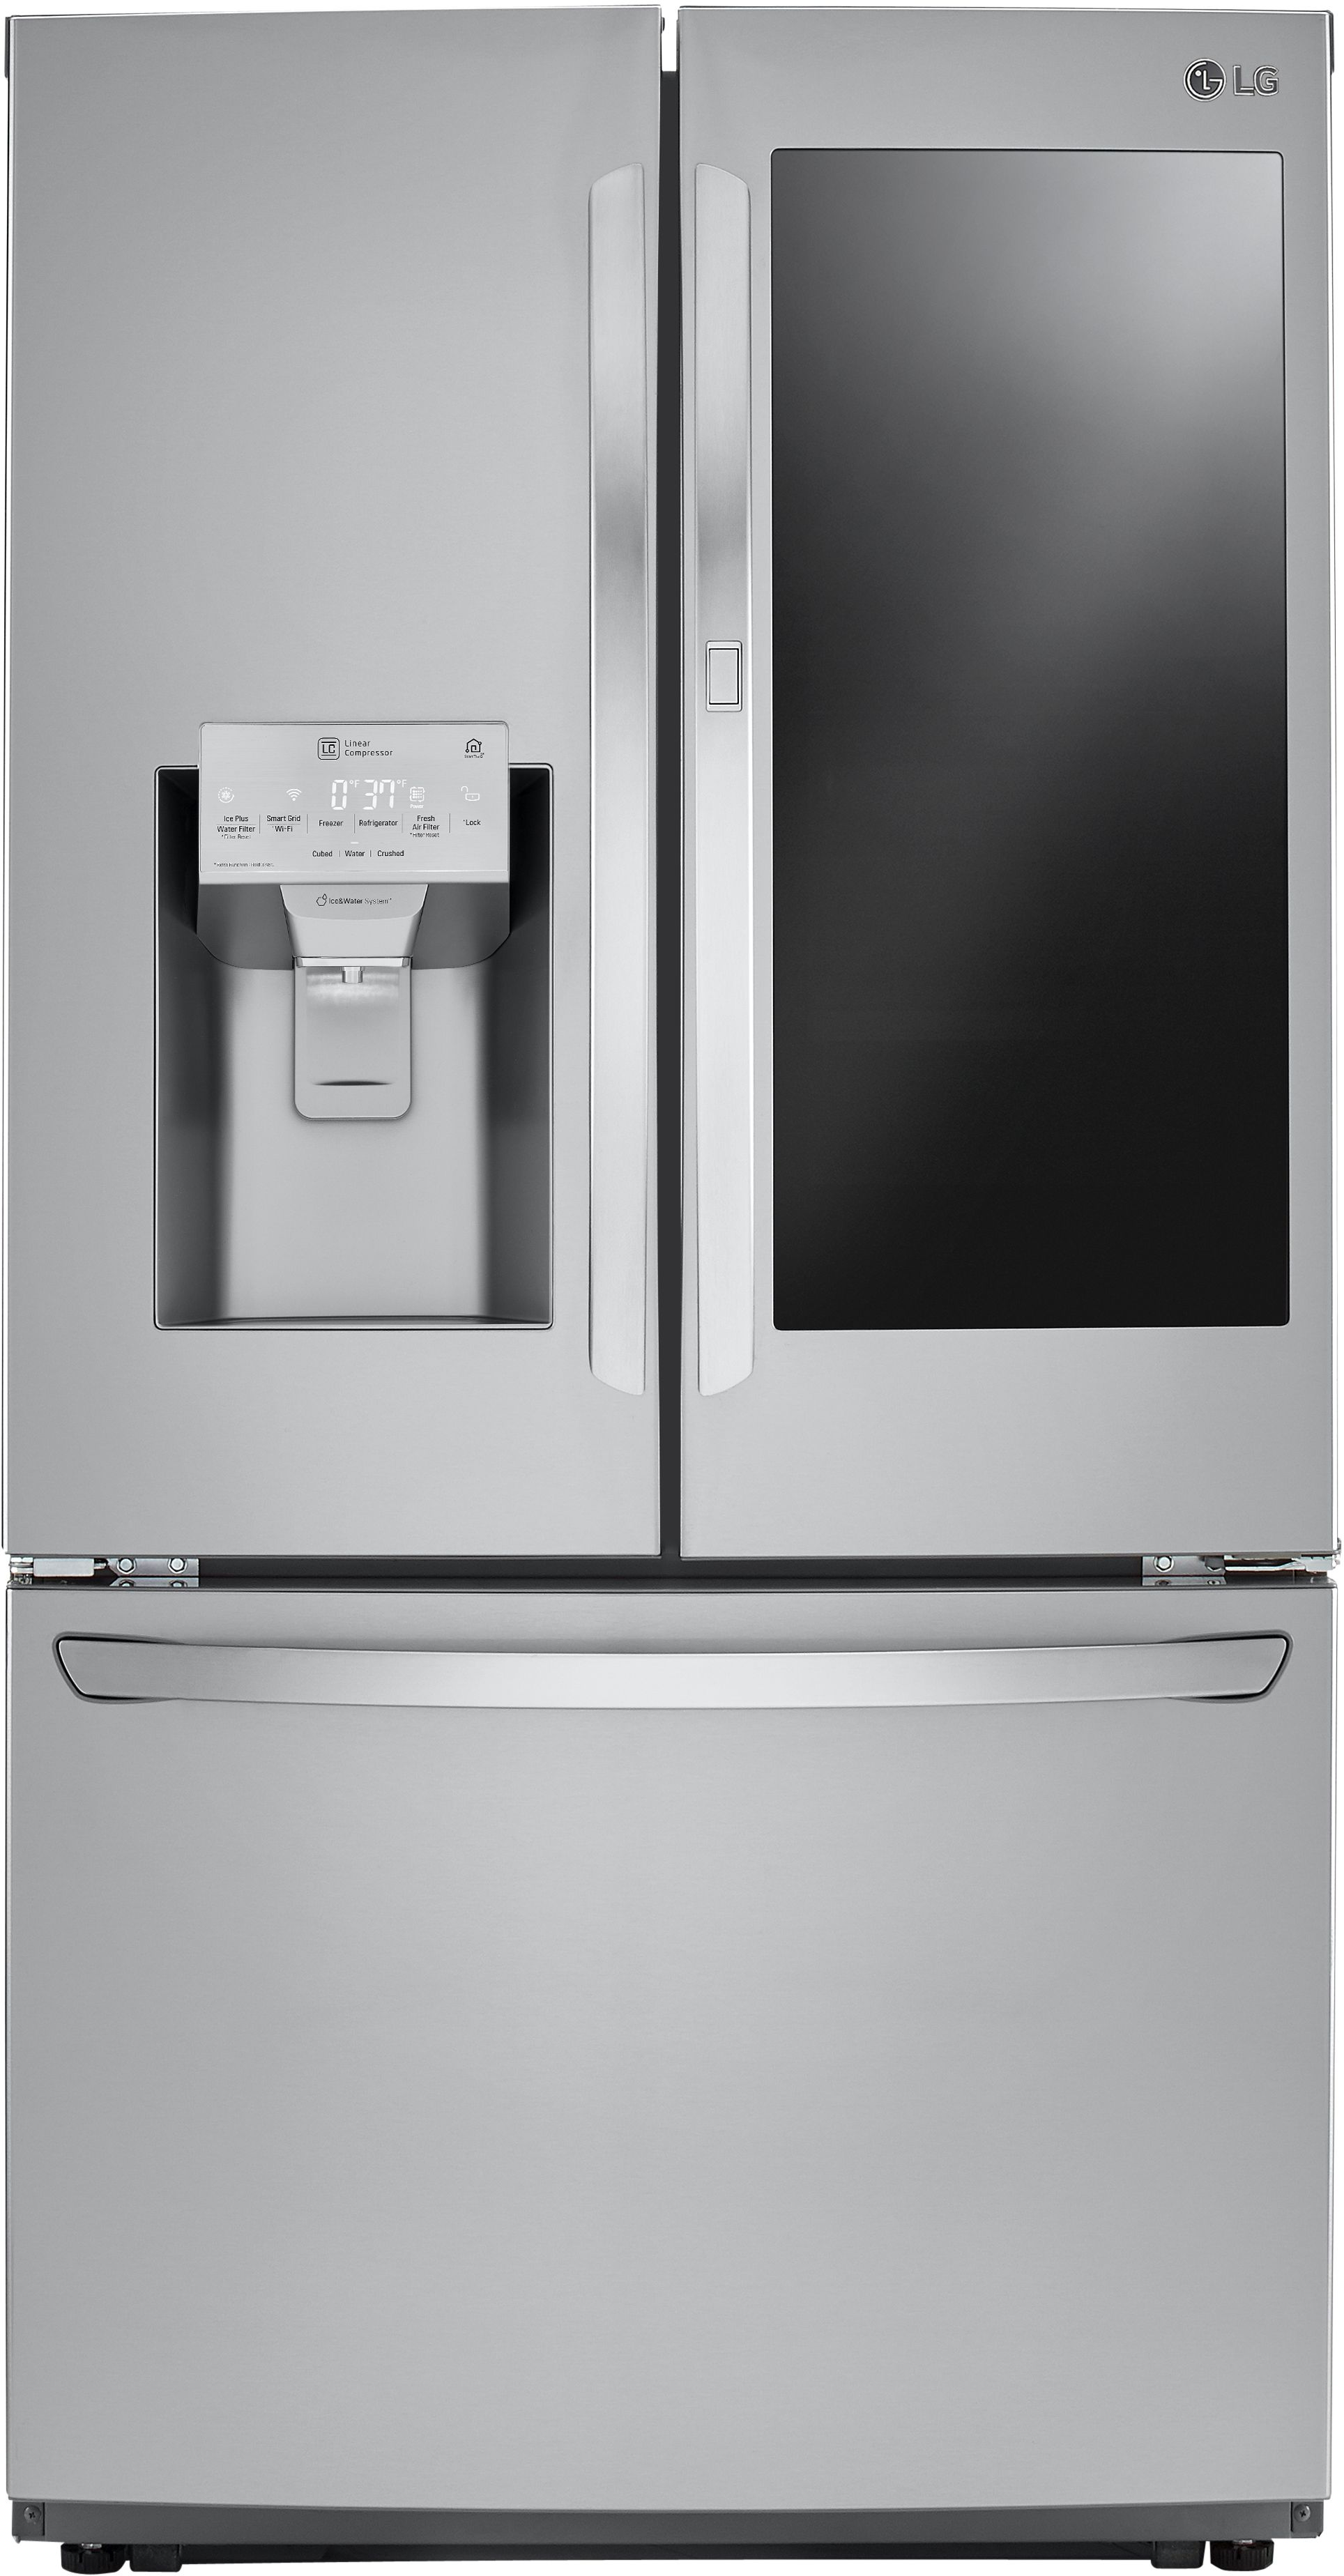 Lg 26 Cu Ft French Door Refrigerator Stainless Steel Lfxs26596s